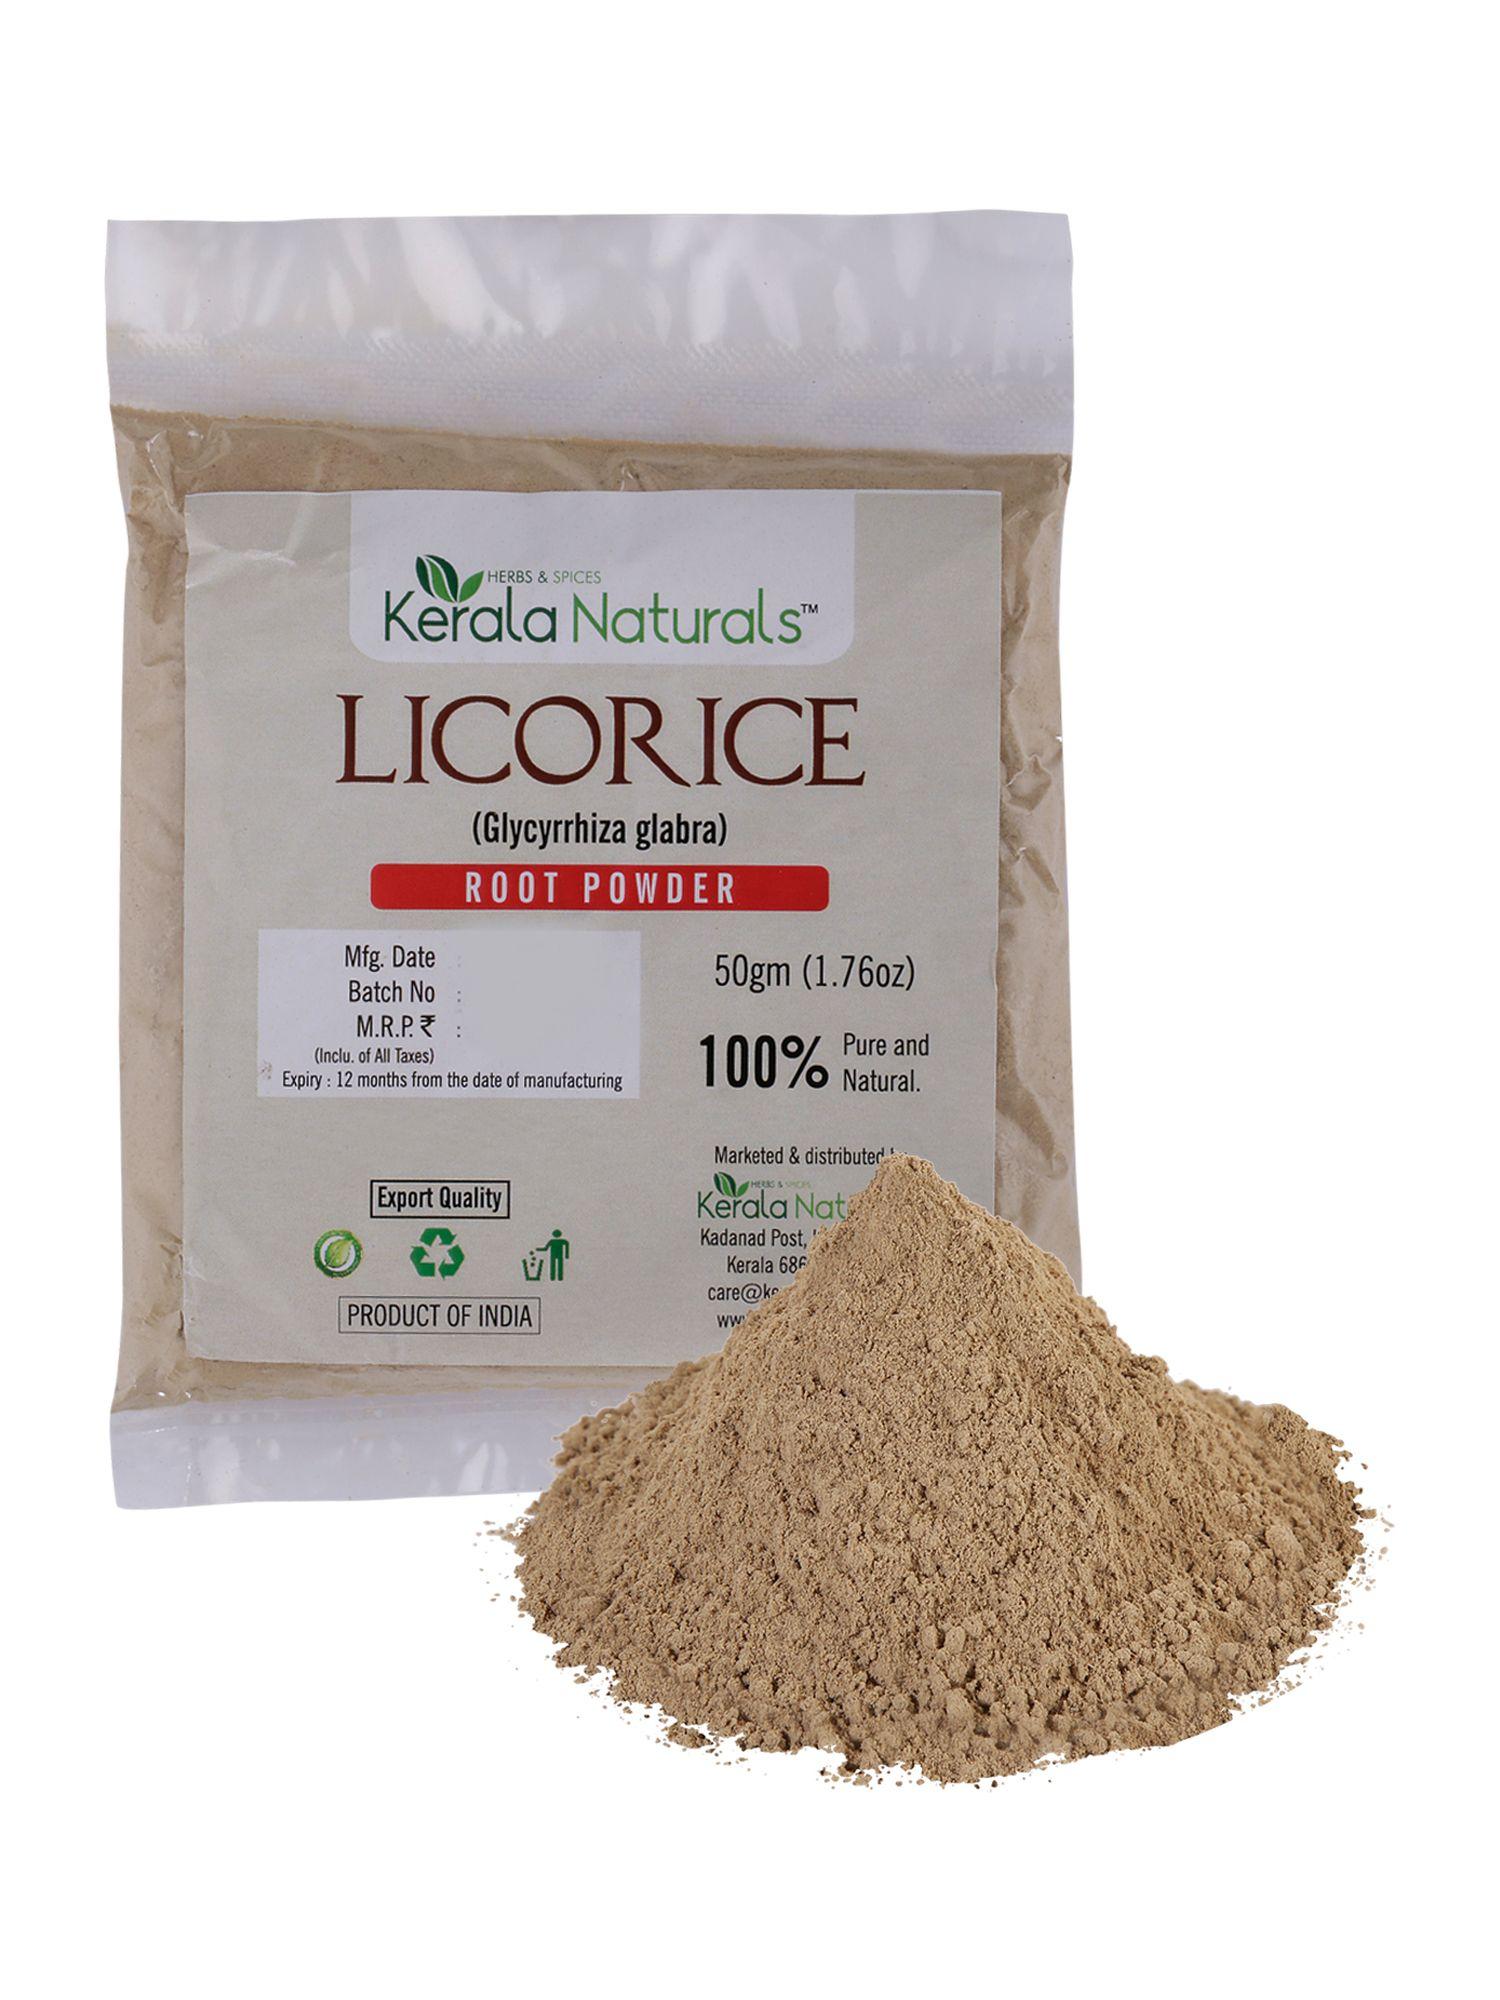 Licorice Root Powder In 2020 Licorice Licorice Root Licorice Root Extract